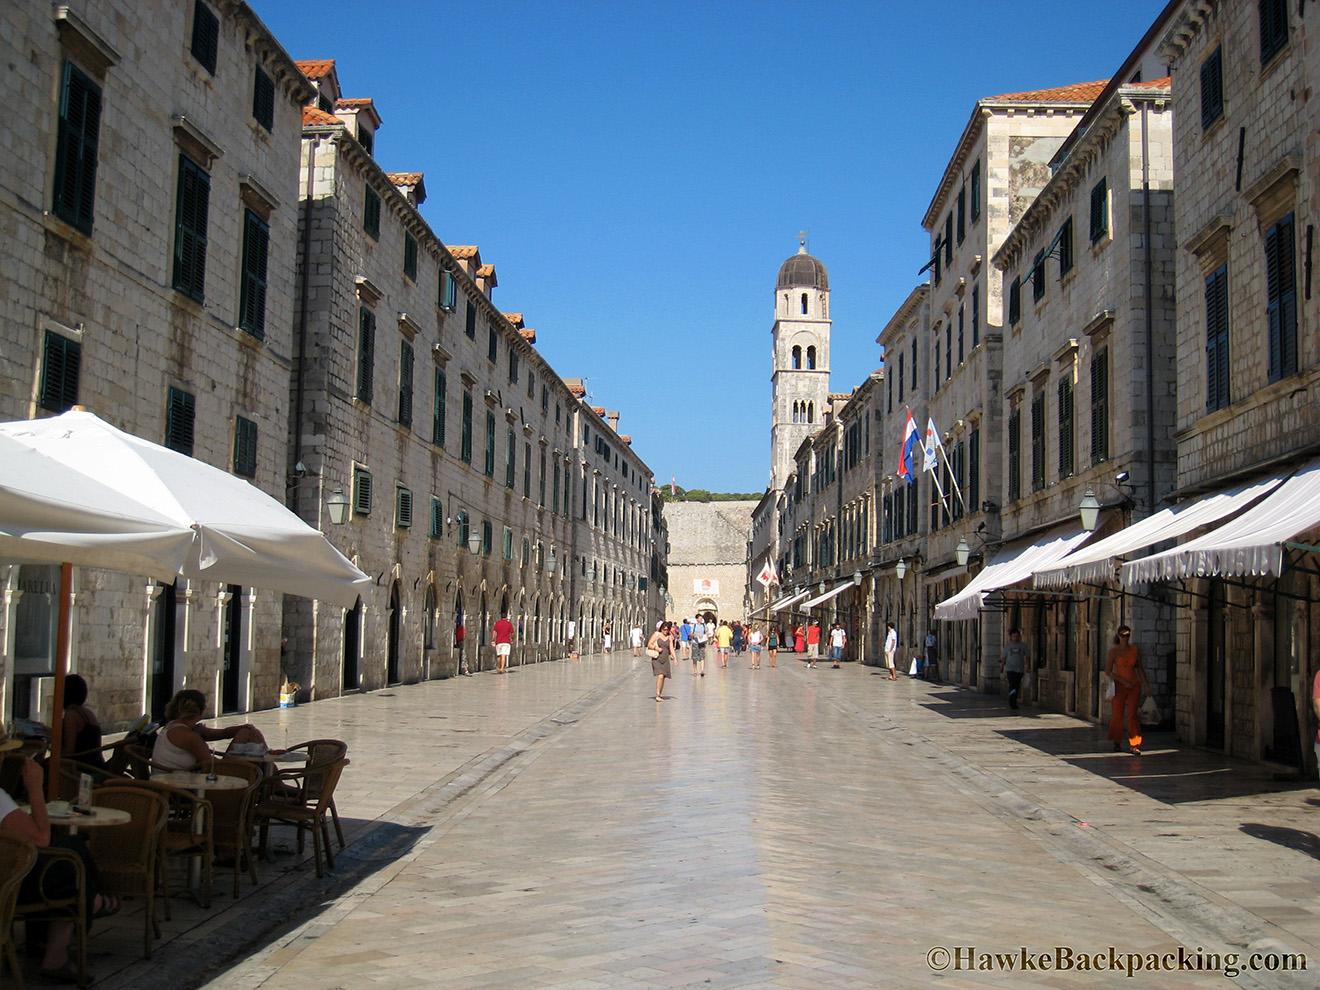 Dubrovnik Hawkebackpacking Com